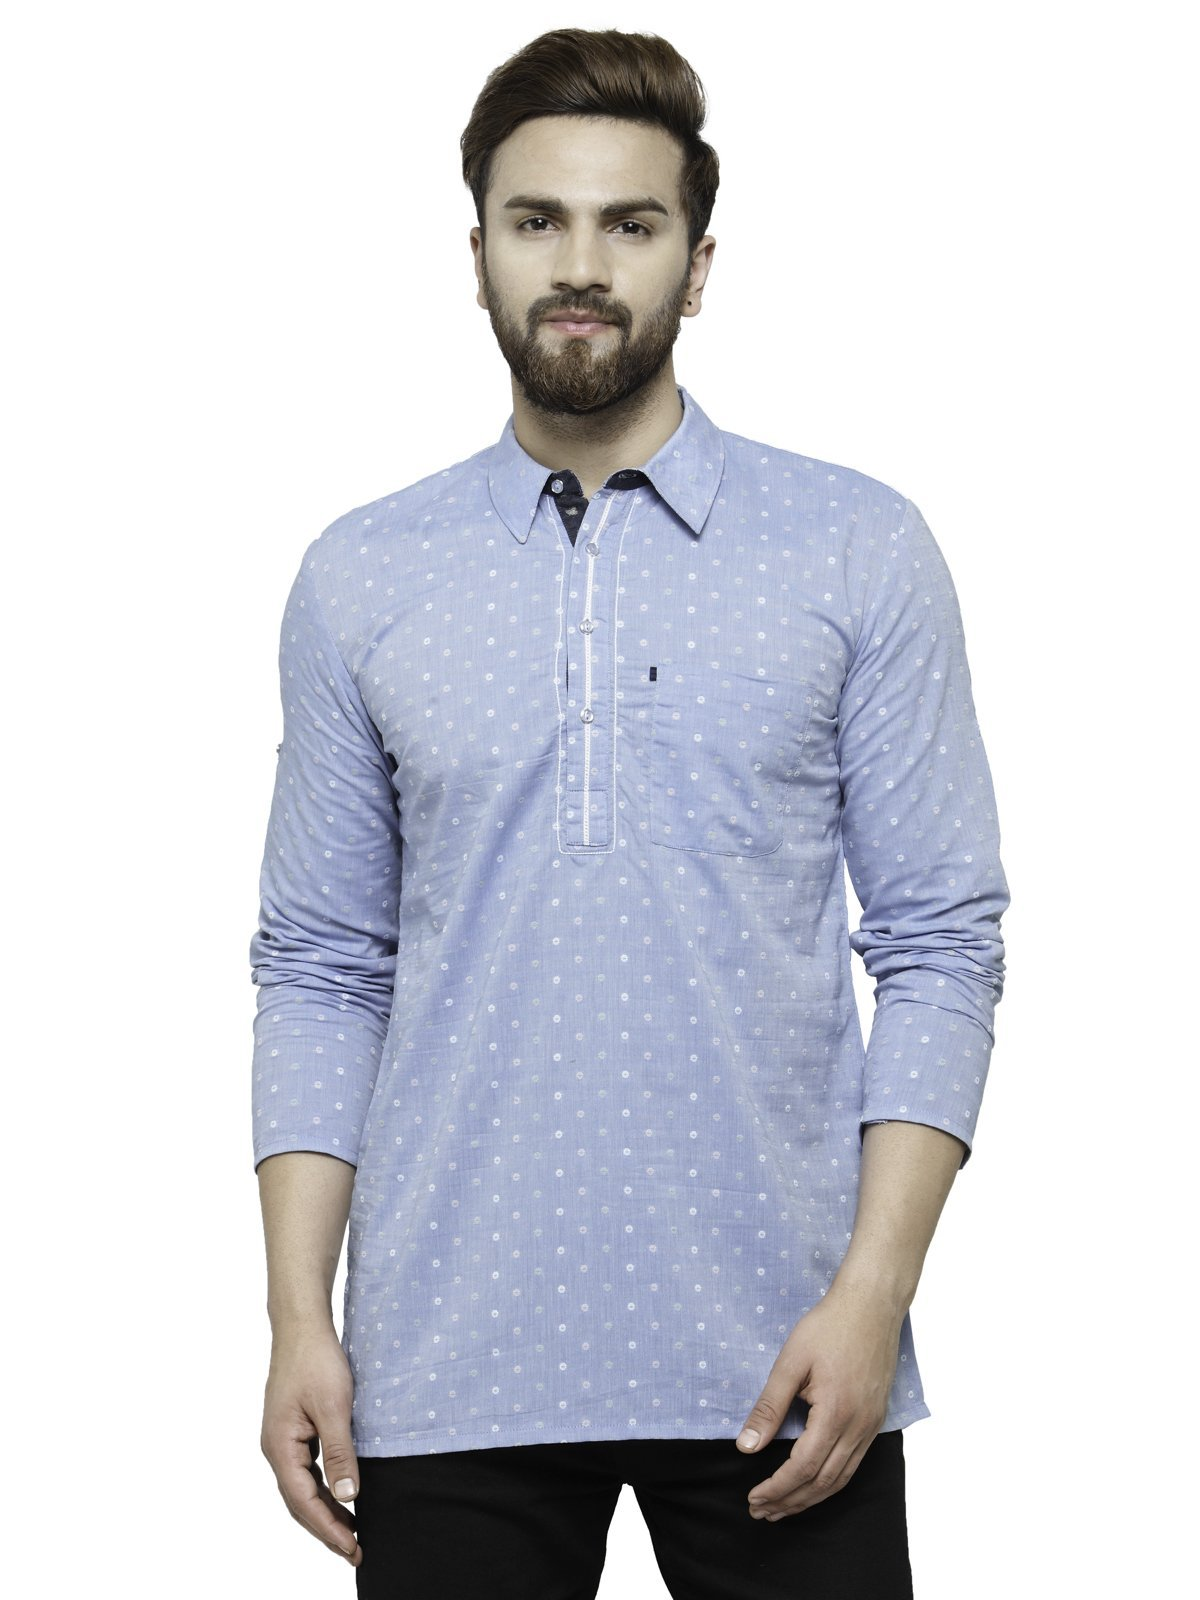 Apparel Men's Cotton Designer Short Kurta 42 Blue